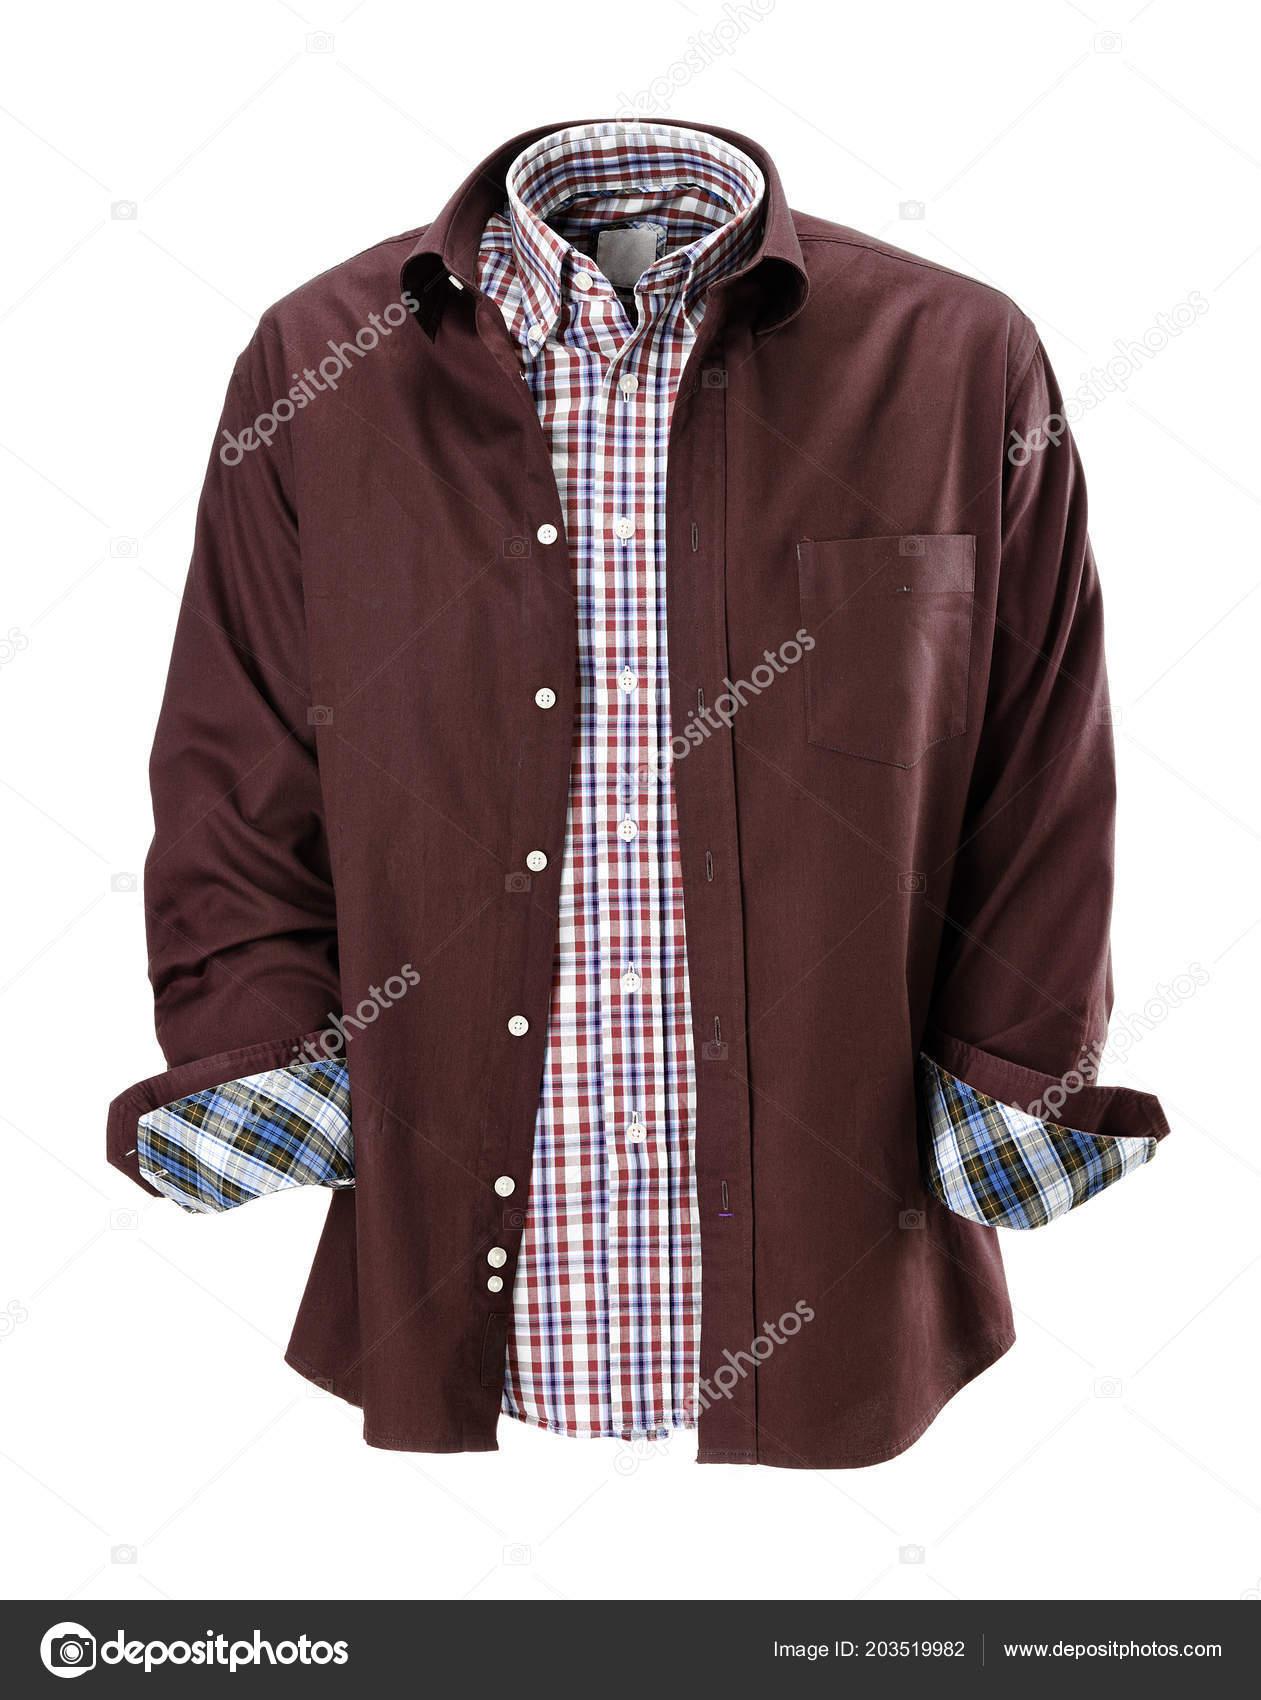 7500f1061 Camisas Sport Para Hombre Aislado — Foto de stock © estudiosaavedra ...